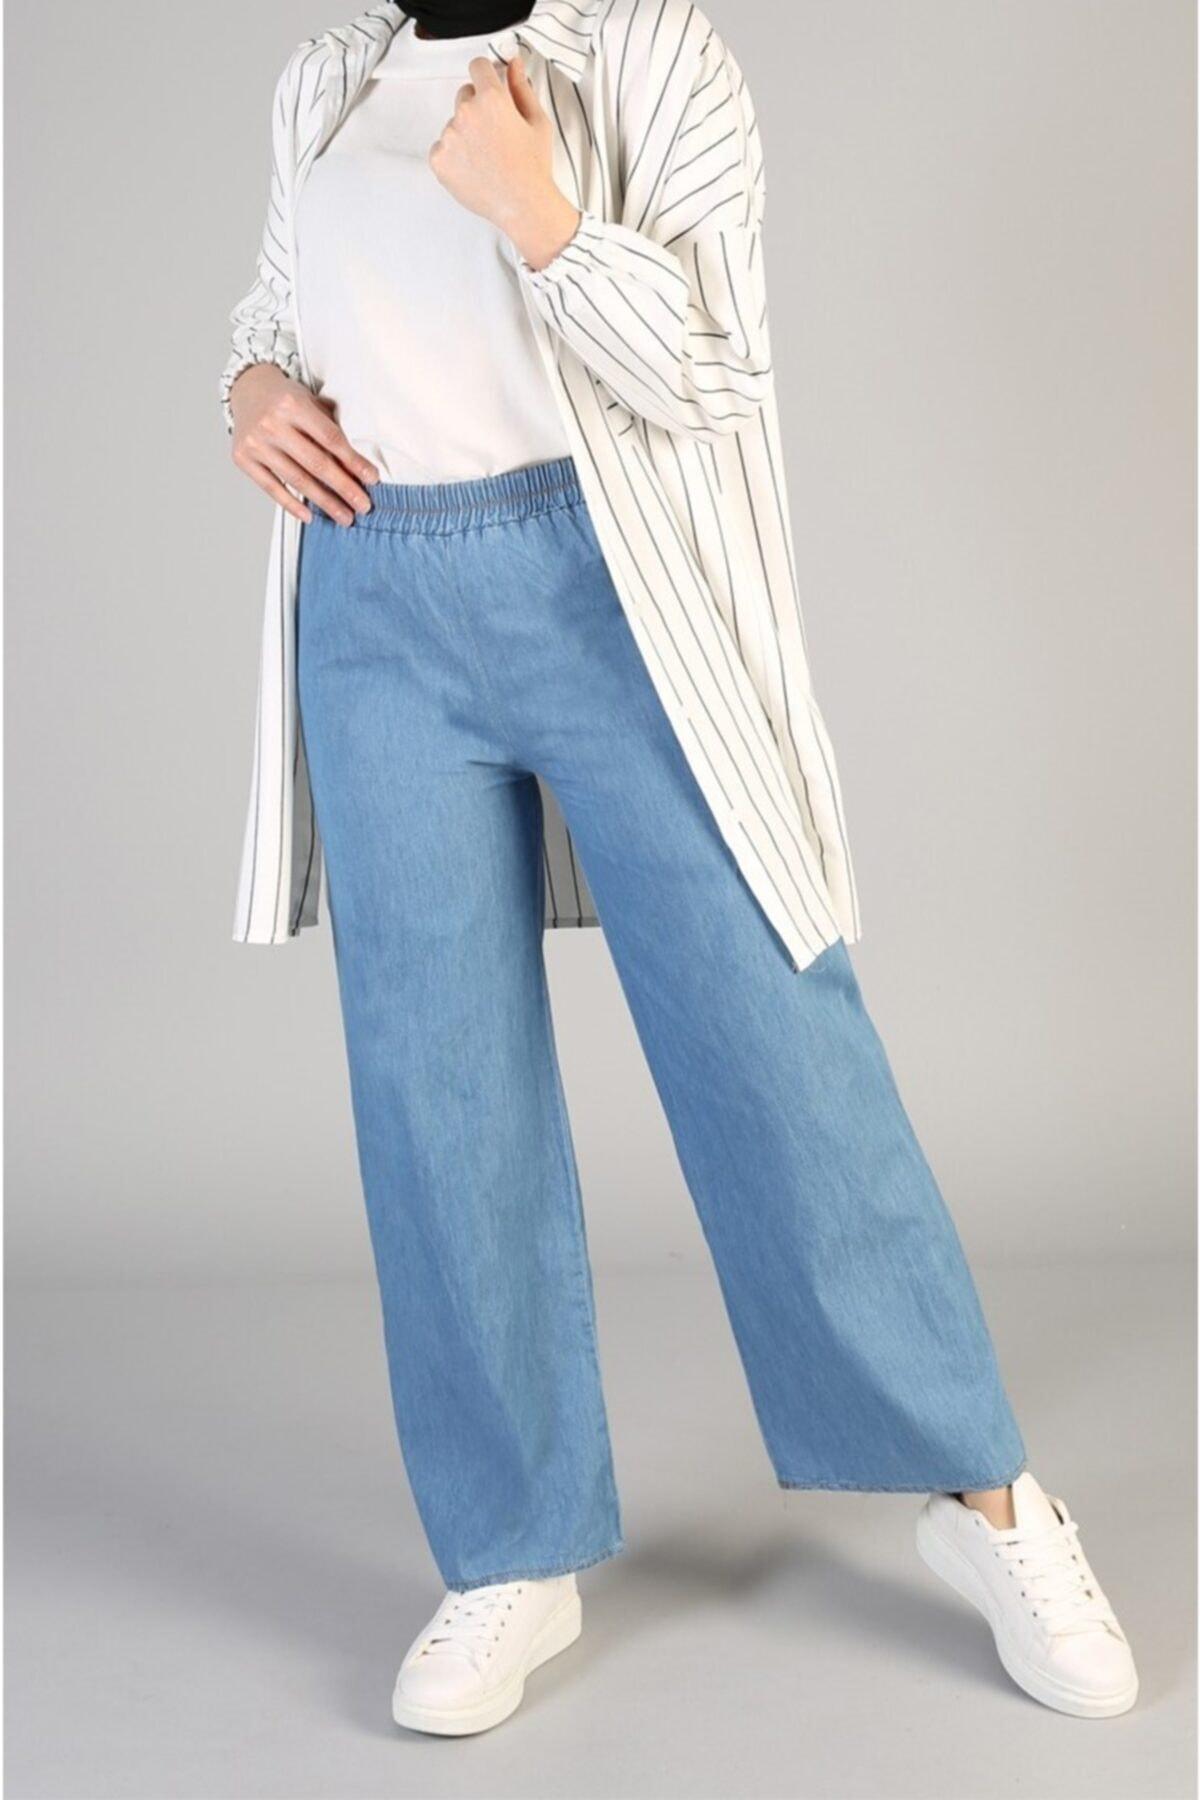 Kadın Açık Mavi Bol Paça Kot Pantolon